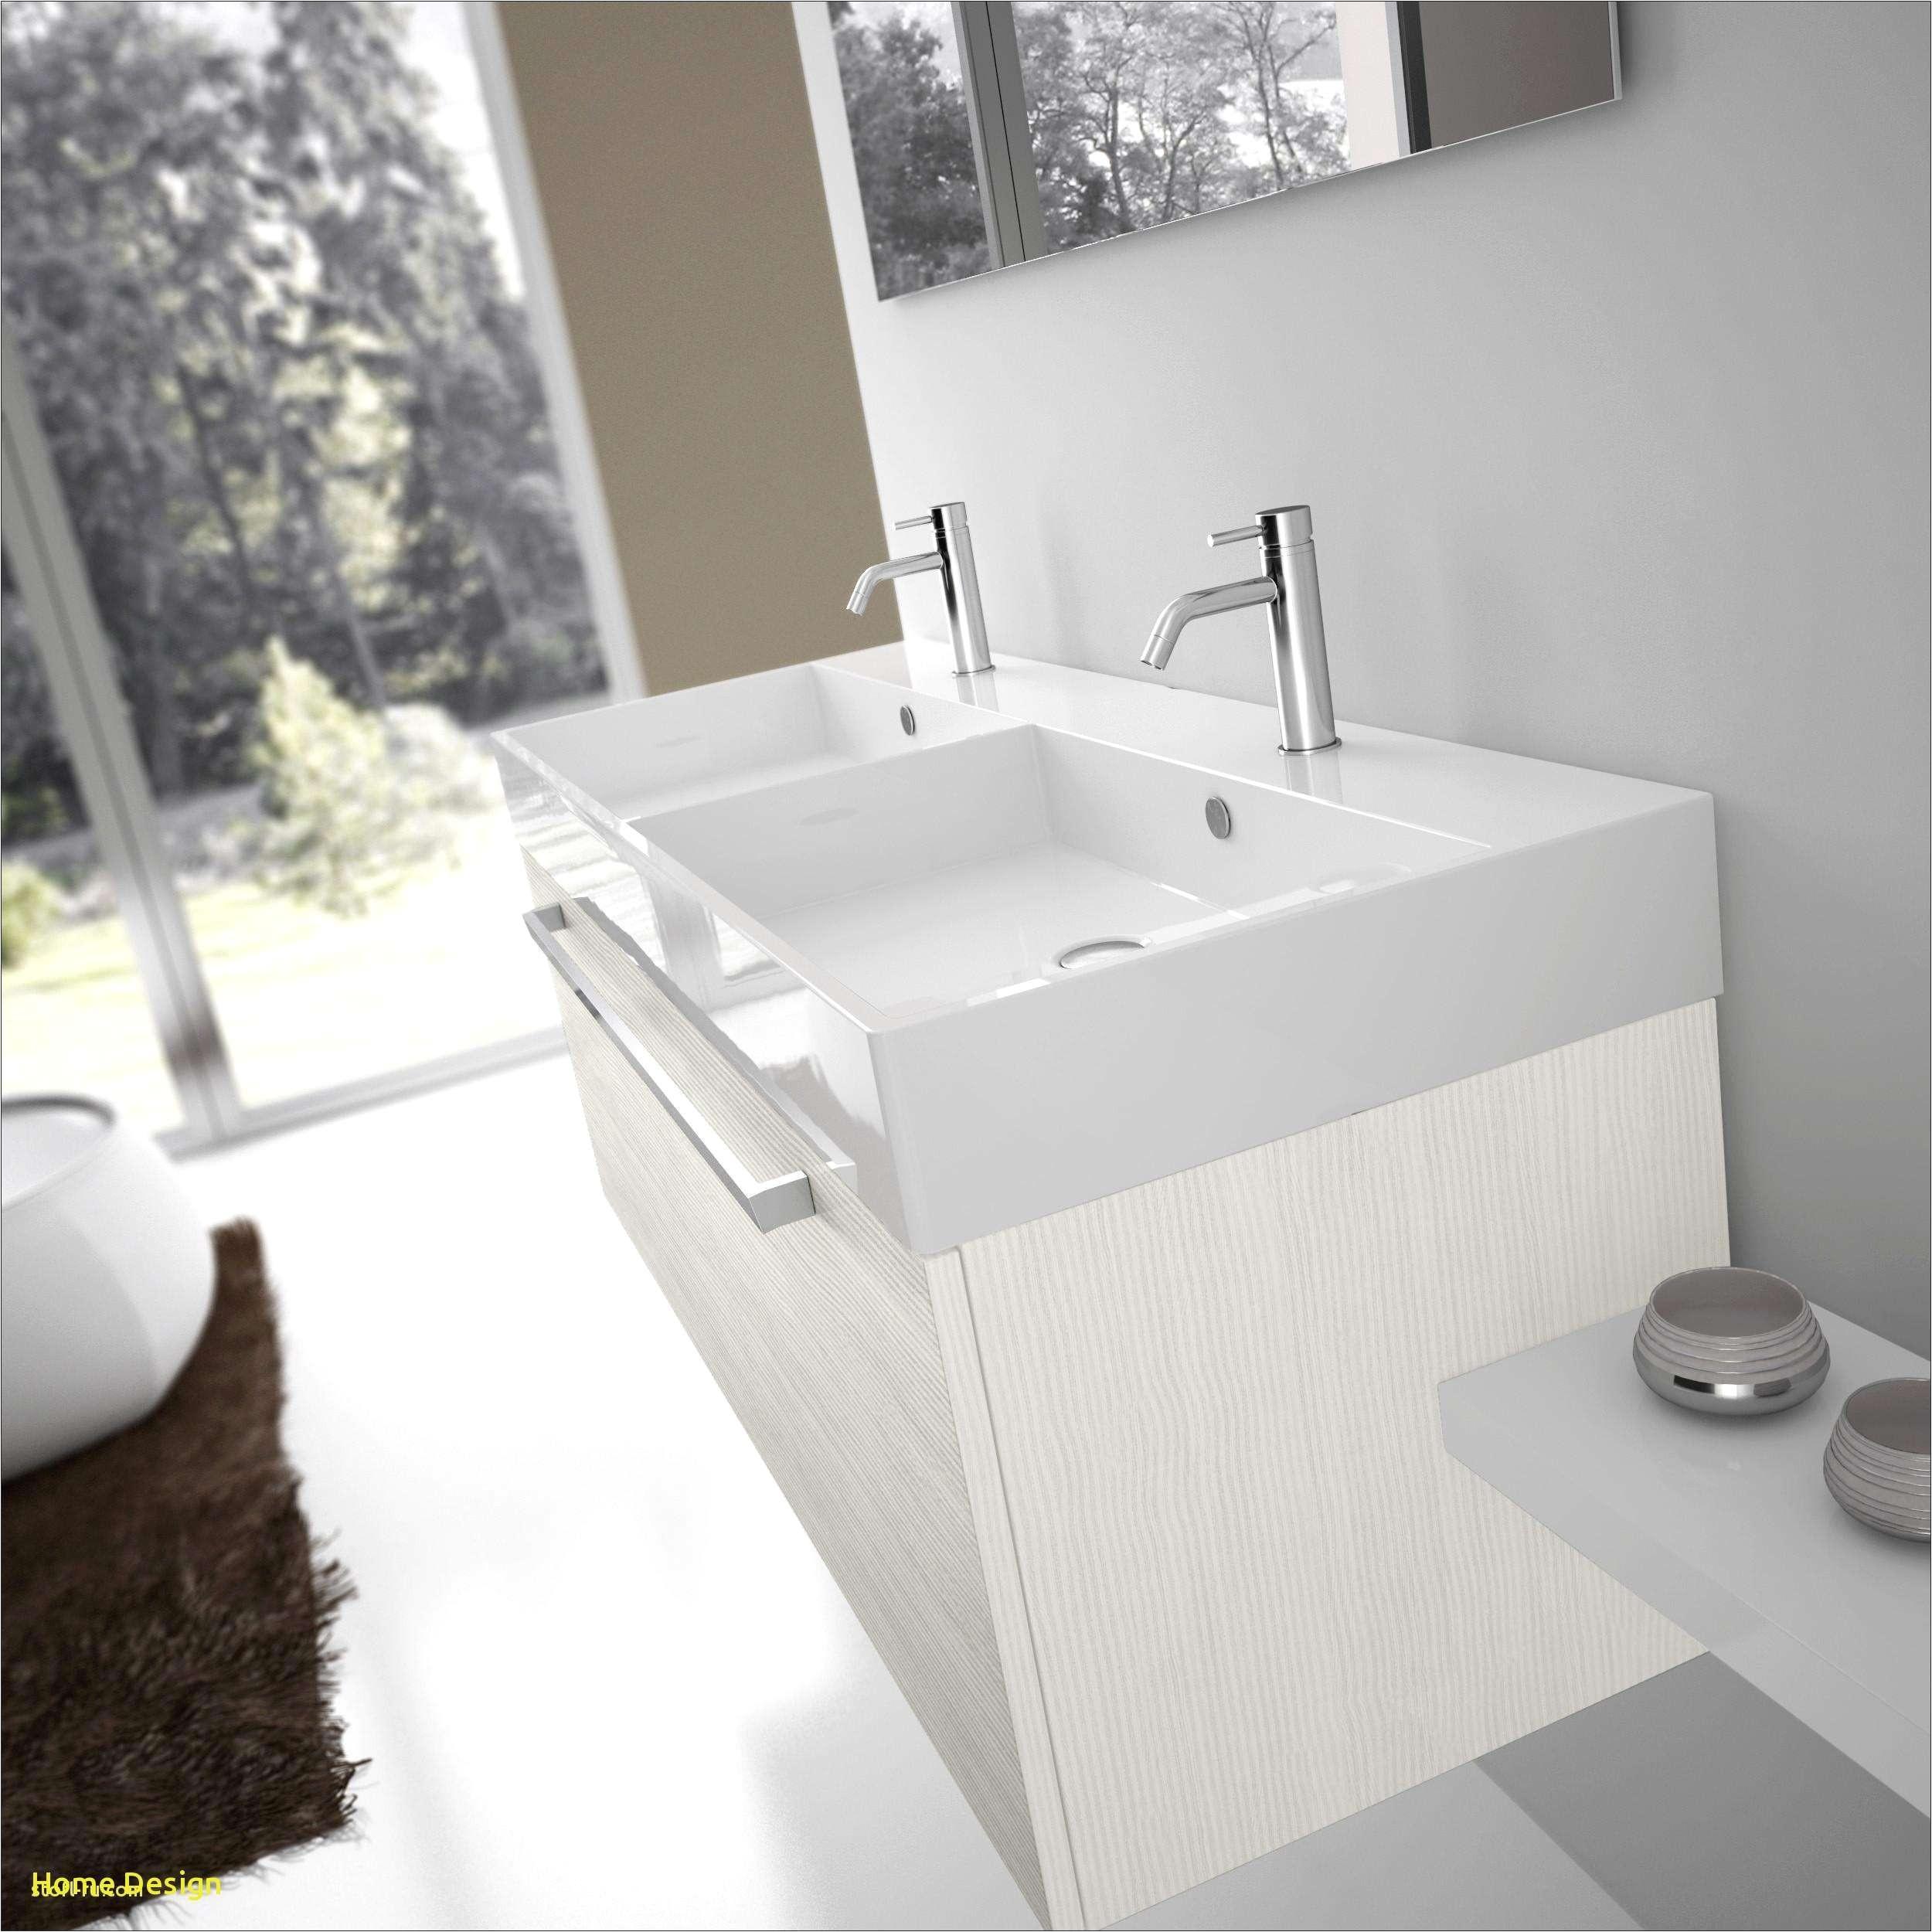 Chanel Bathroom Ideas Delightful Unique Modern 1 2 Bathroom Design Home Design